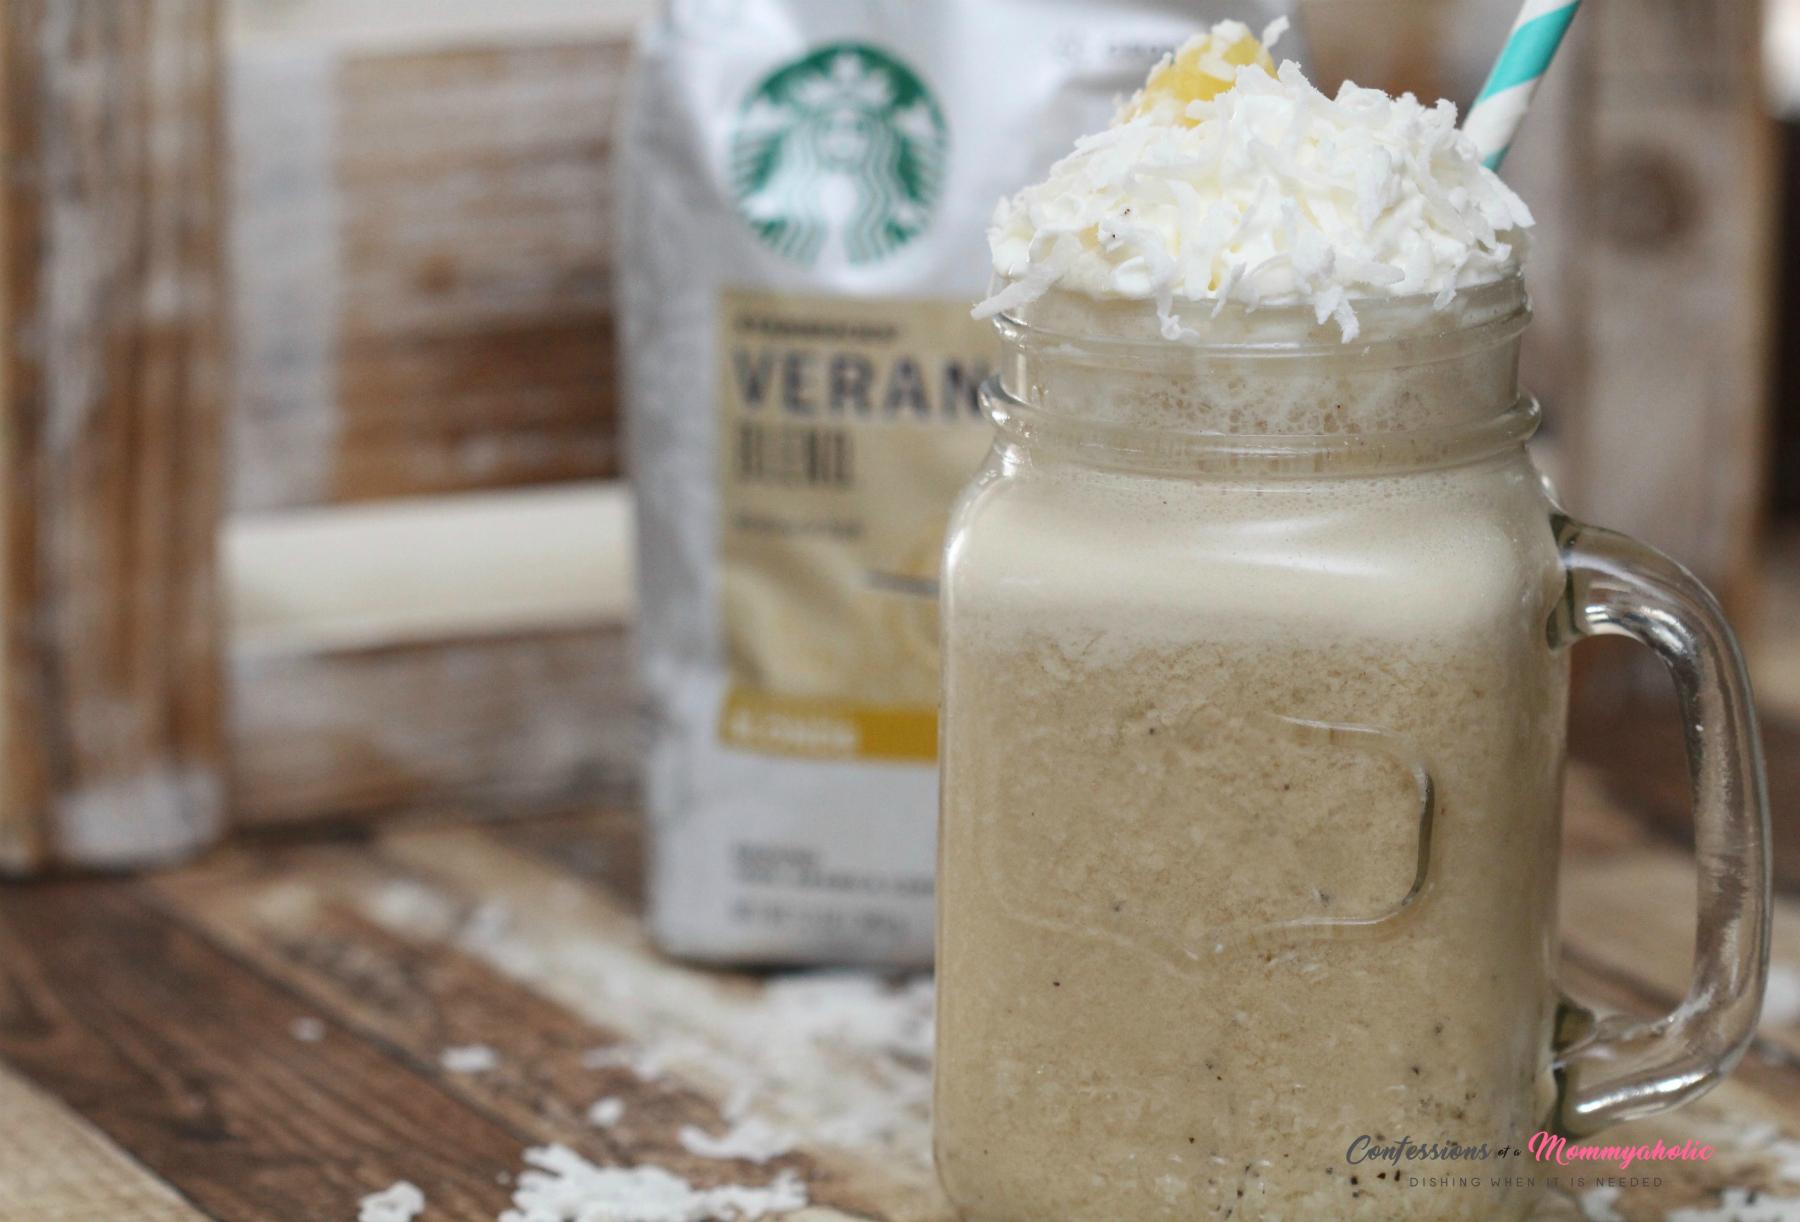 Pina Colada Iced Coffee Starbucks Veranda Blend 2